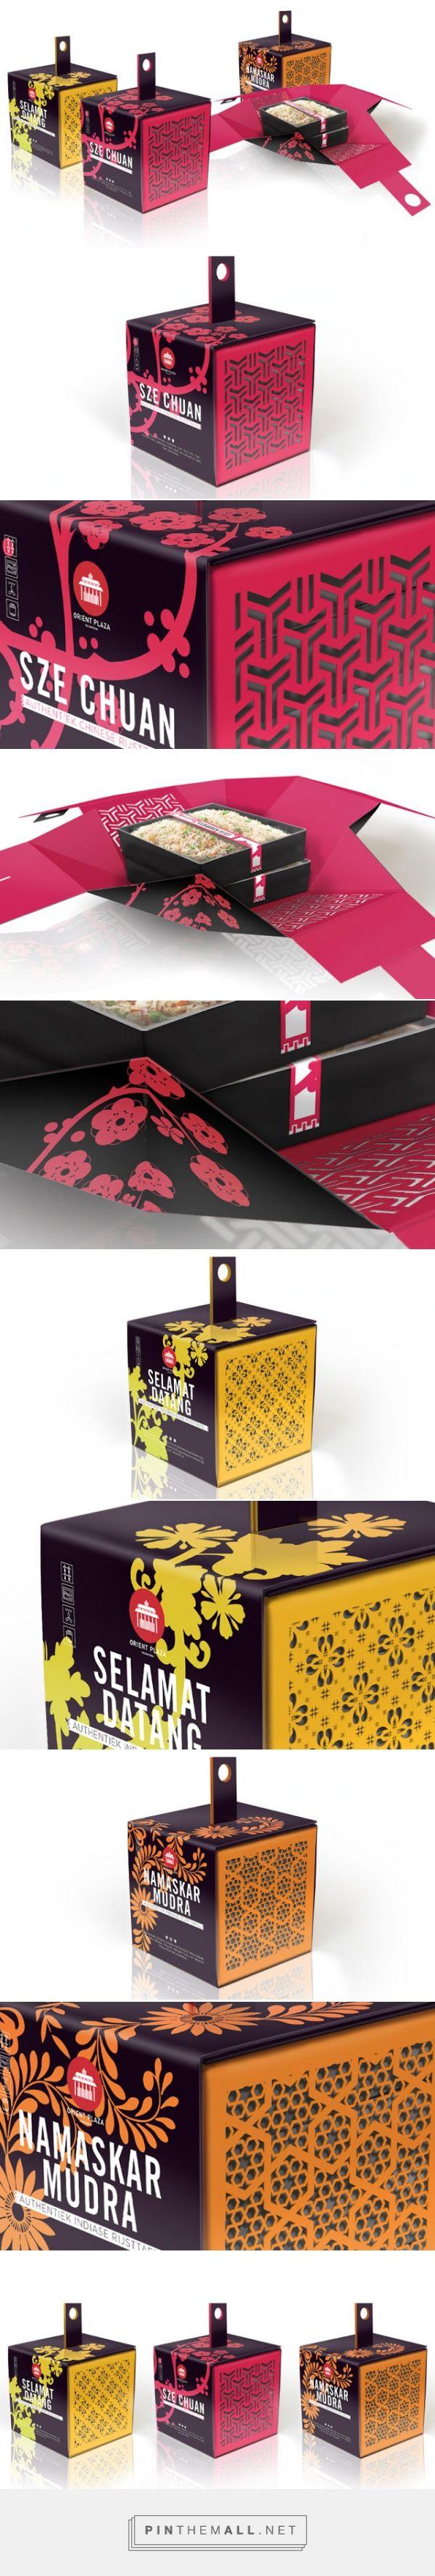 Oriental #Packaging #Design #Concept by Reynhard. Communication Design - http://www.packagingoftheworld.com/2014/12/oriental-packaging-design-concept.html